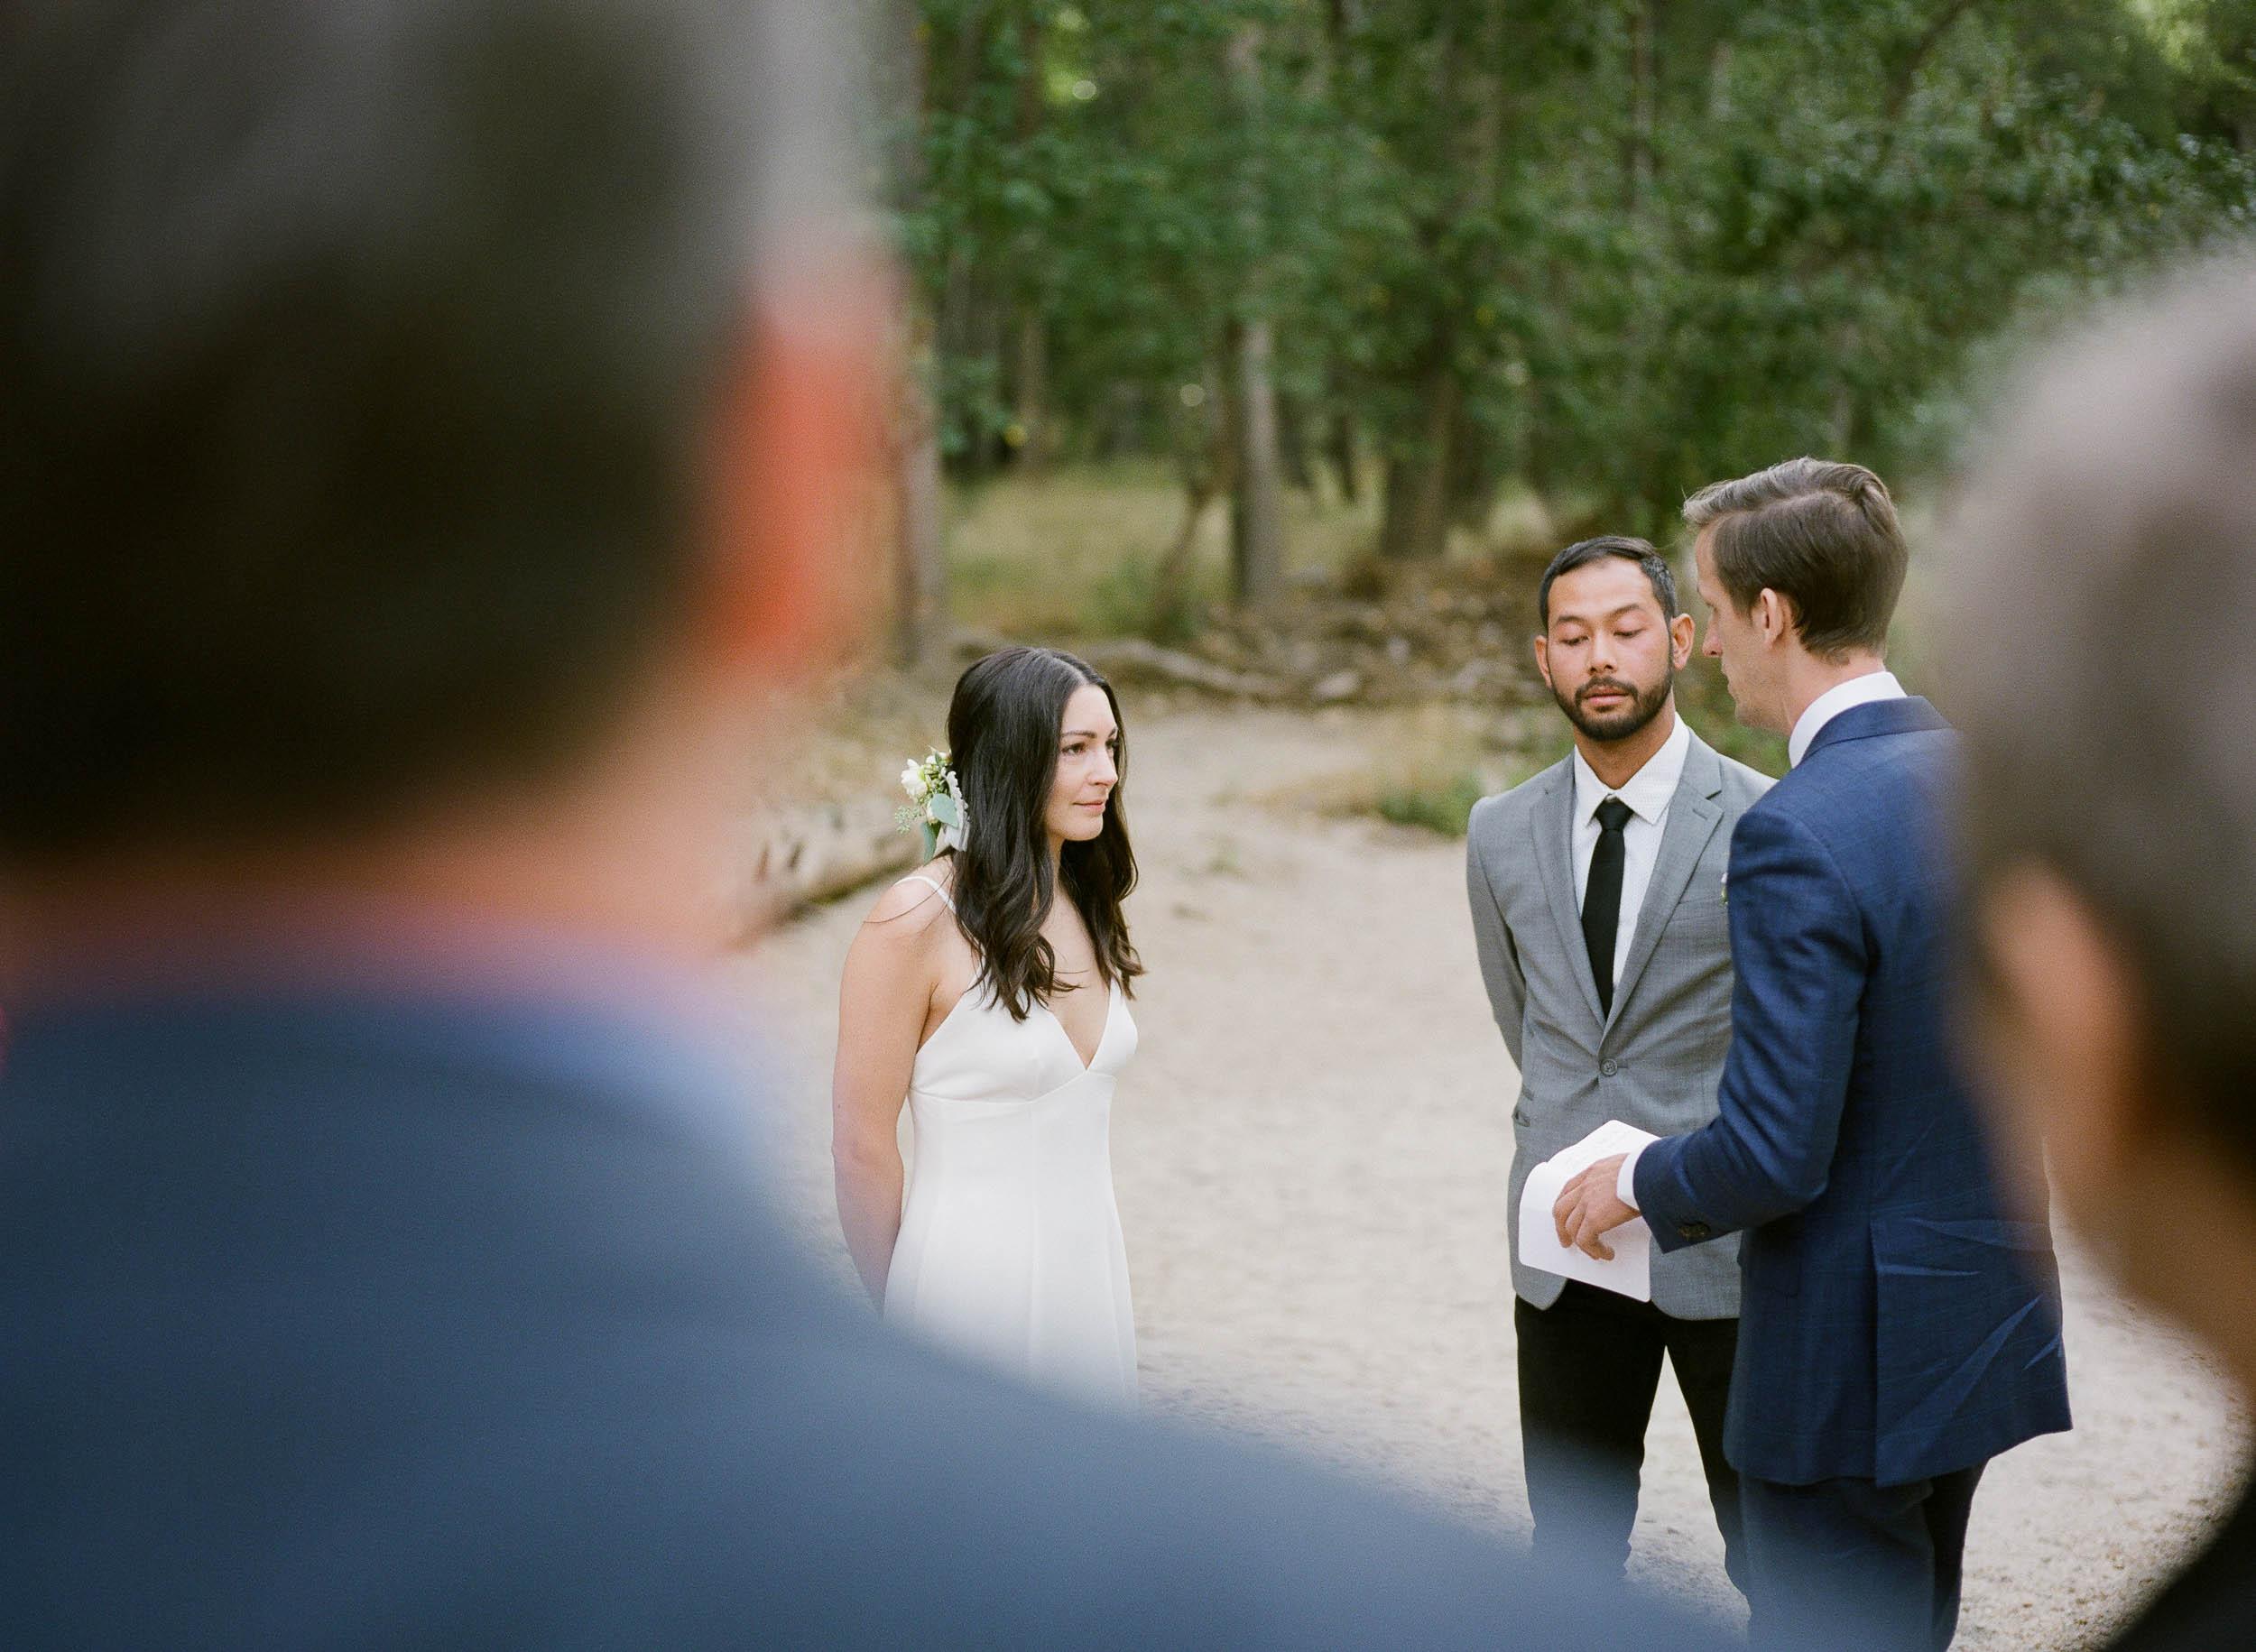 Intimate Yosemite Wedding_Buena Lane Photography_000063860009.jpg